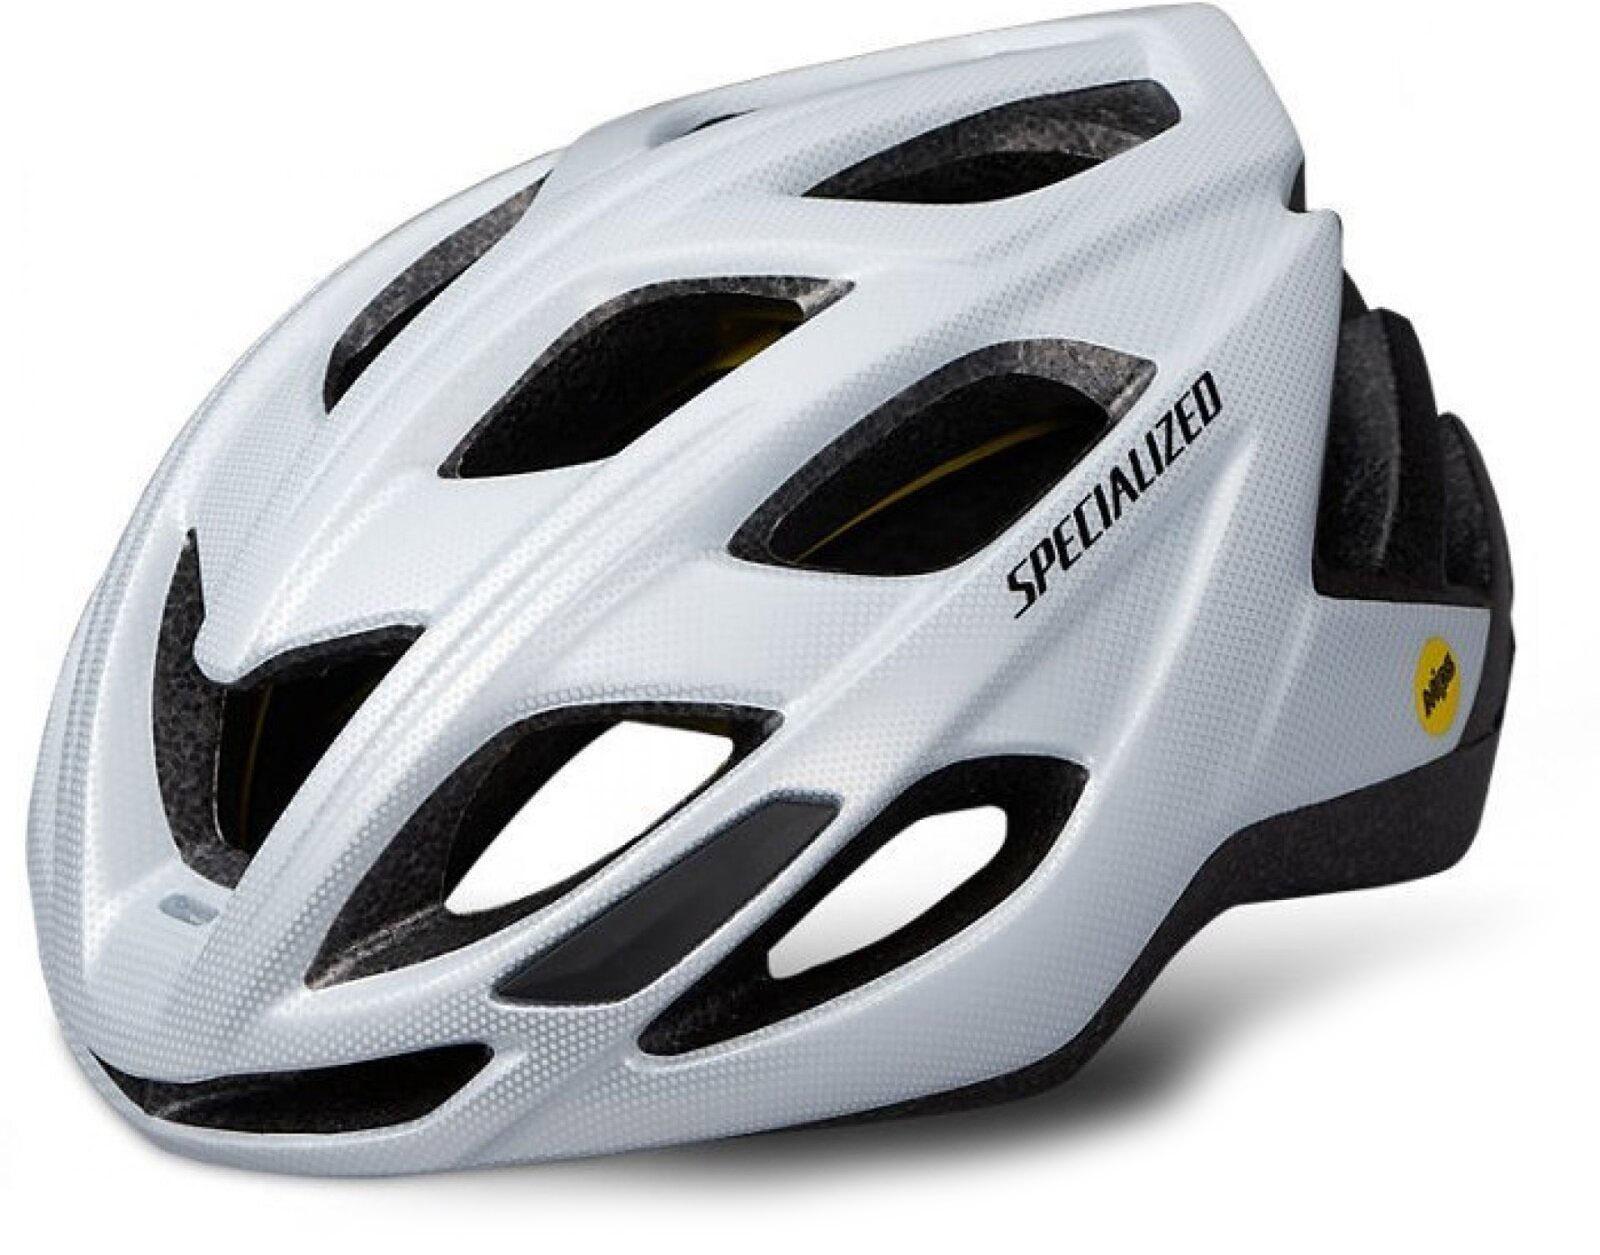 Specialized Chamonix Mips cykelhjelm - Hvid  »  Helmet Size: SM/MED (51cm-55cm)